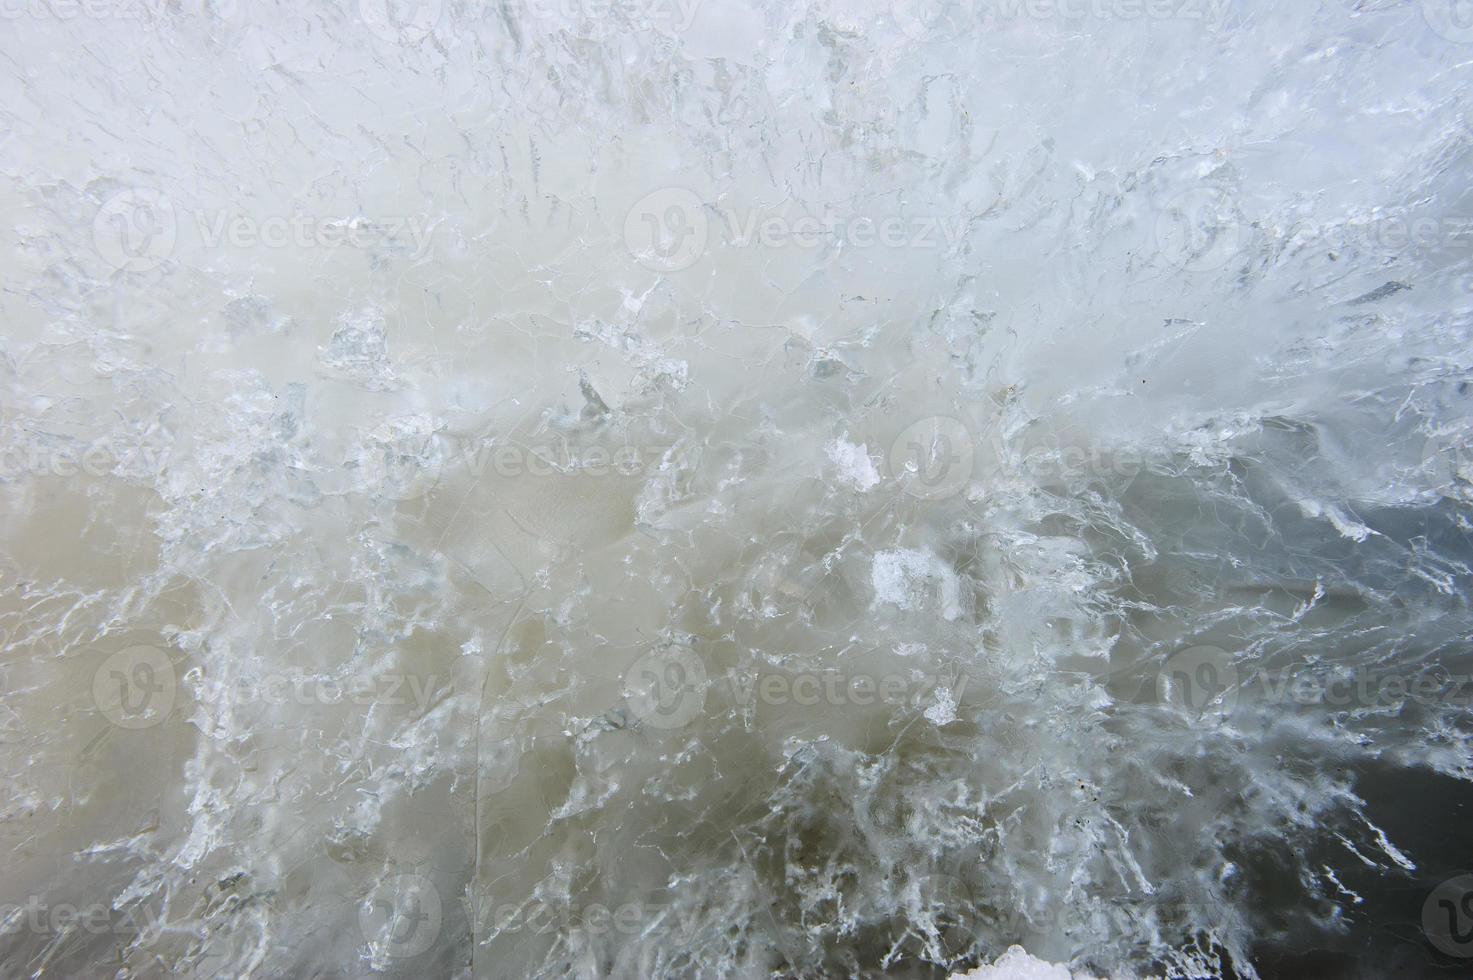 ijs. detailopname. foto